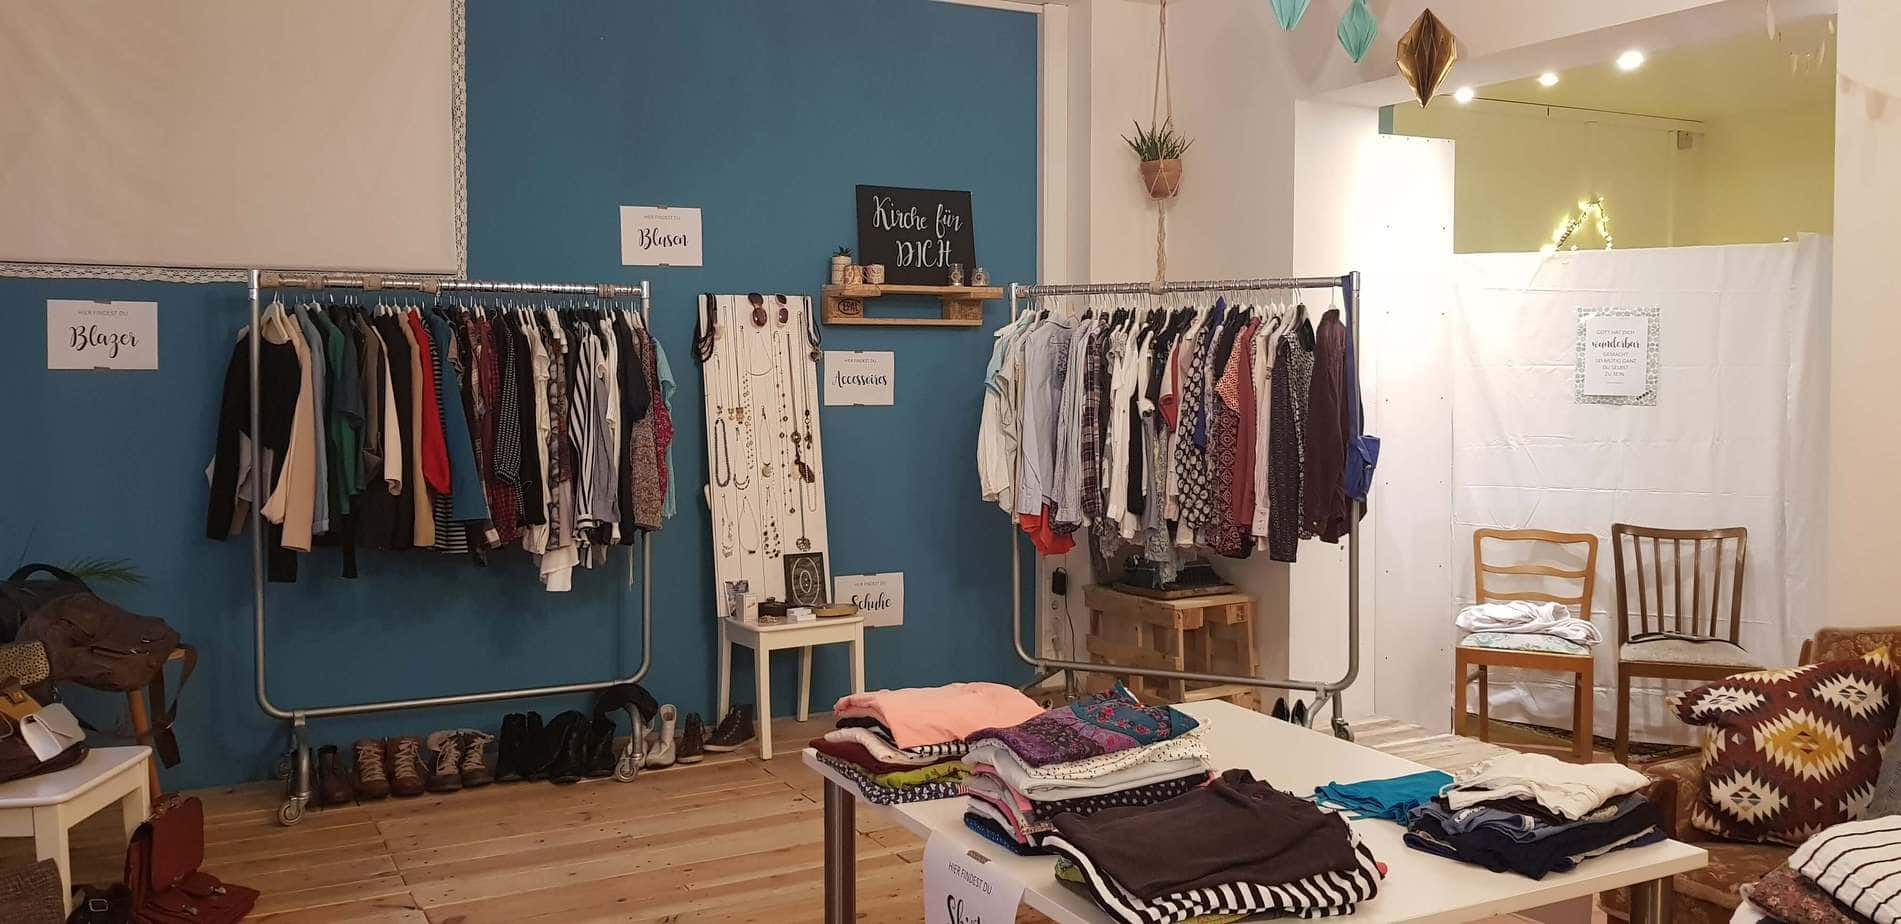 Gerber Lounge goes Fashion